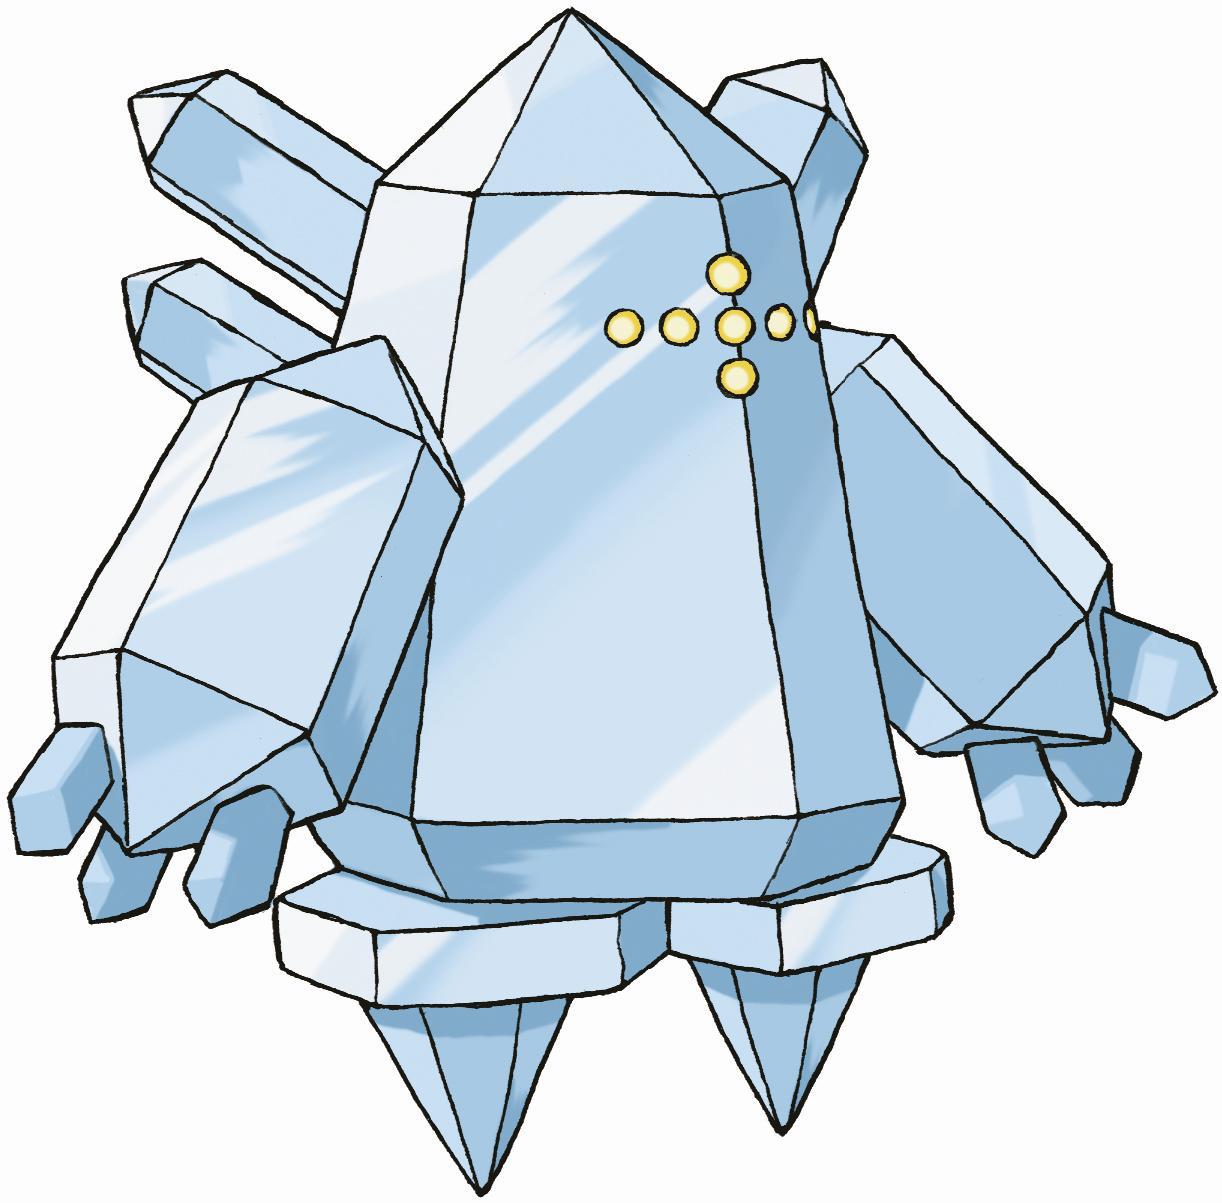 Banque Pokémon - Le trio légendaire Regirock, Regice et Registeel offert ! 378_re11